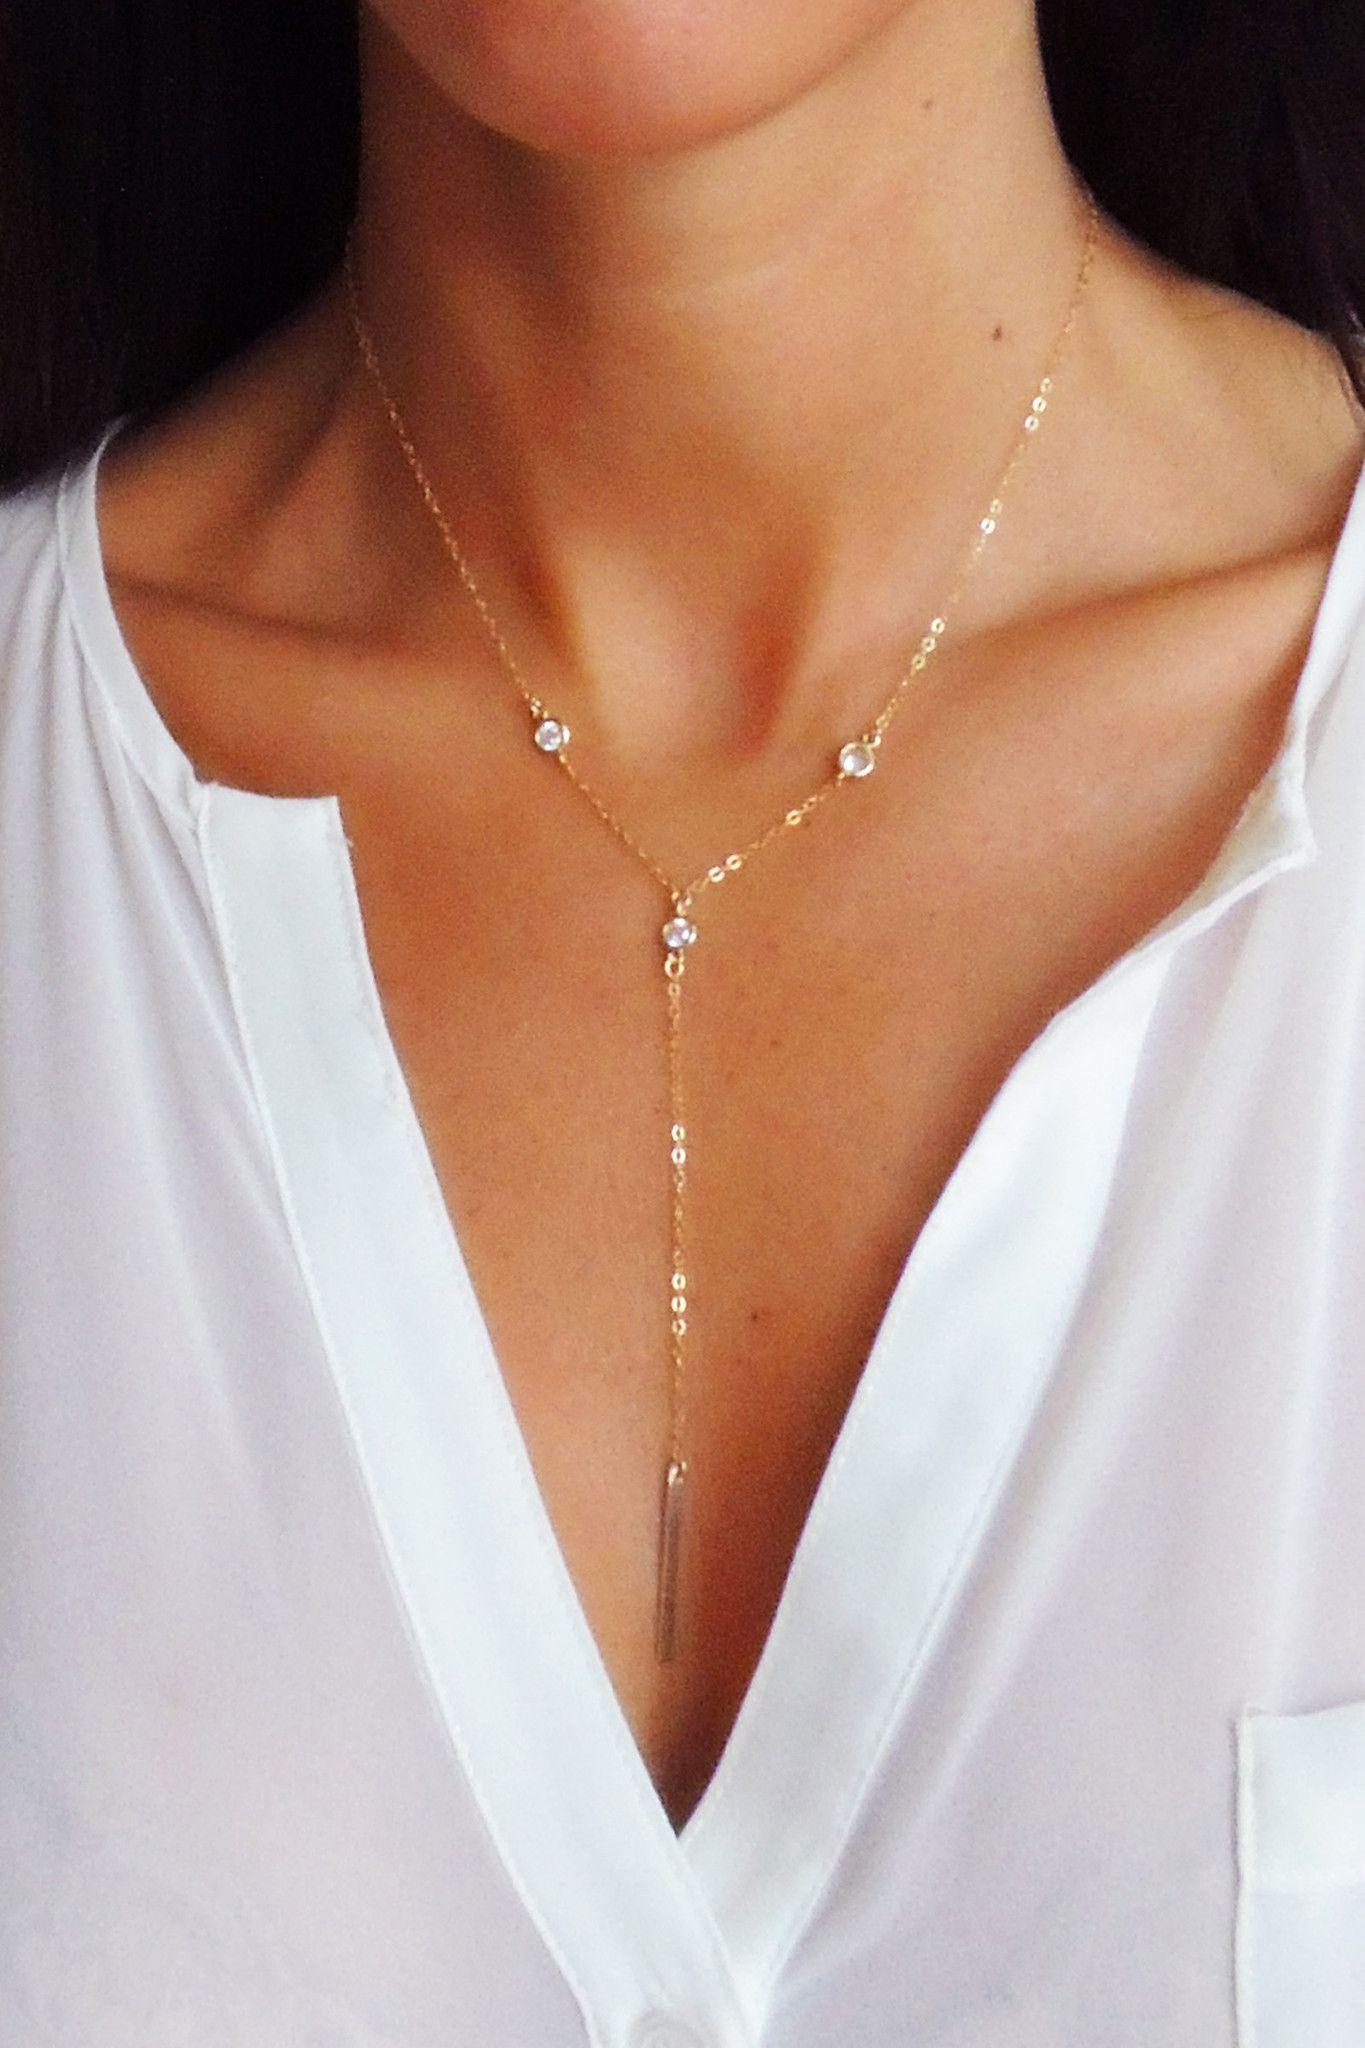 Galactic bar y necklace christine elizabeth jewelry small